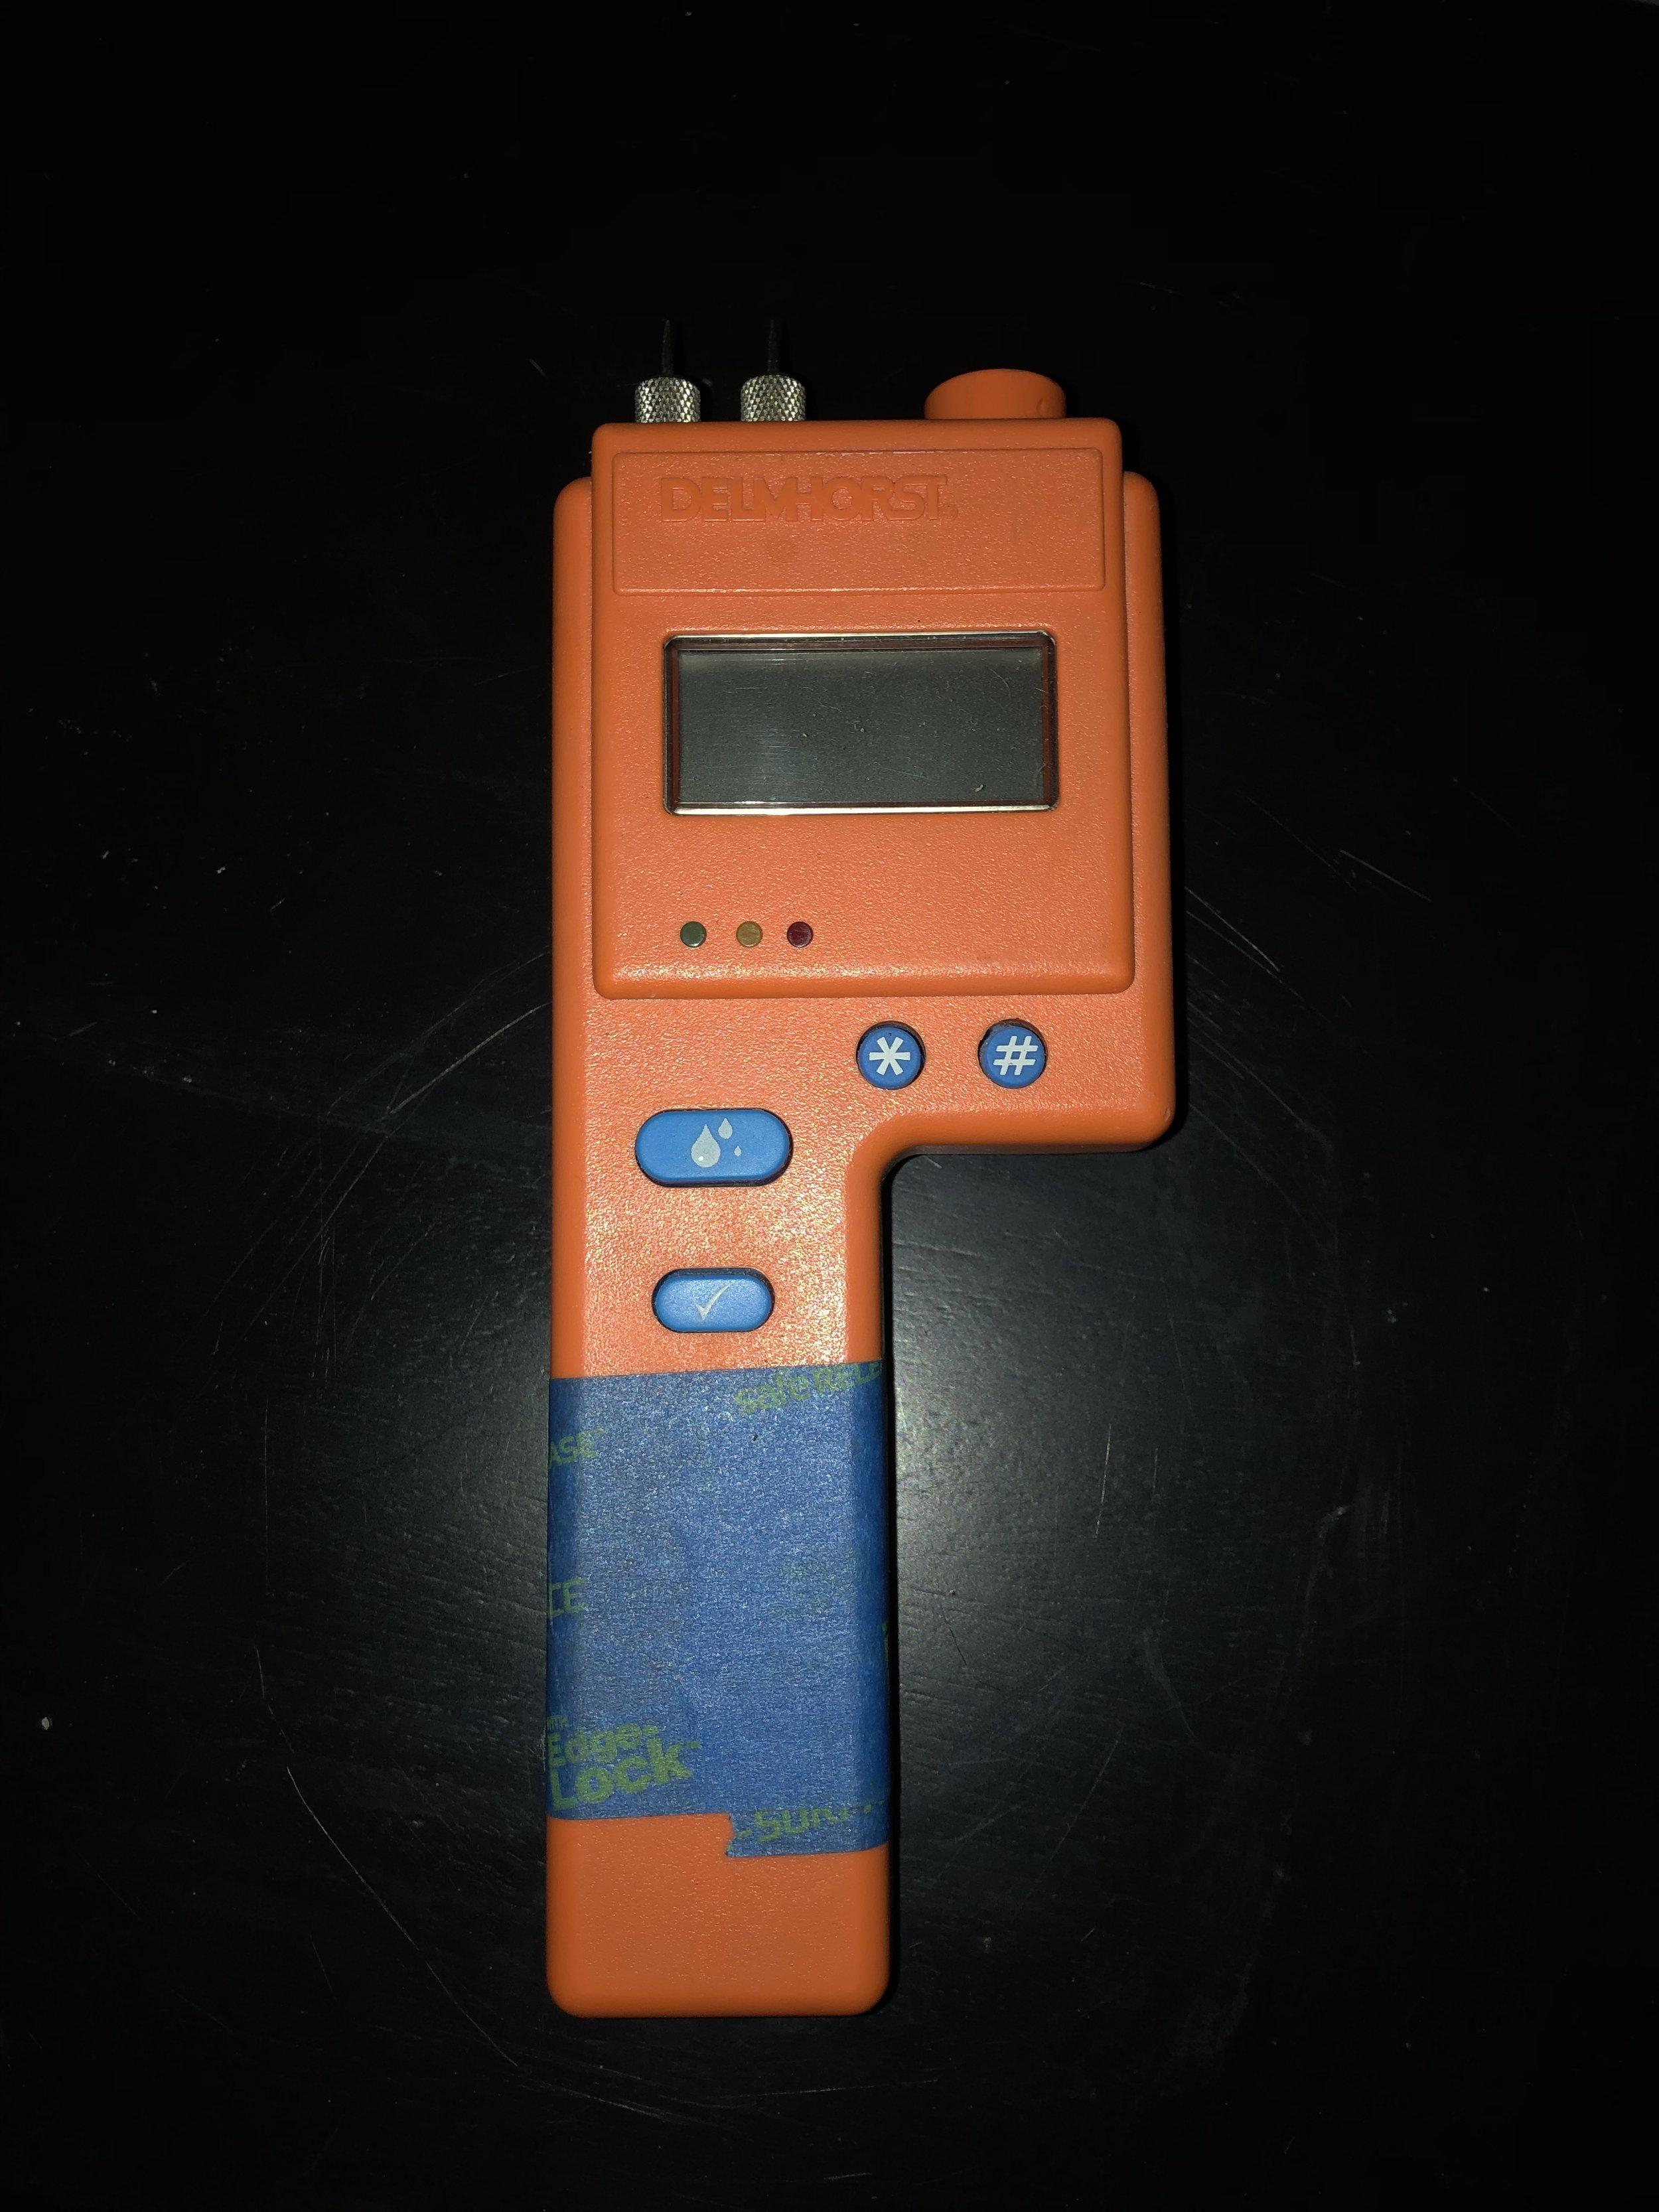 delmhorst-bd-2100-moisture-meter.jpg